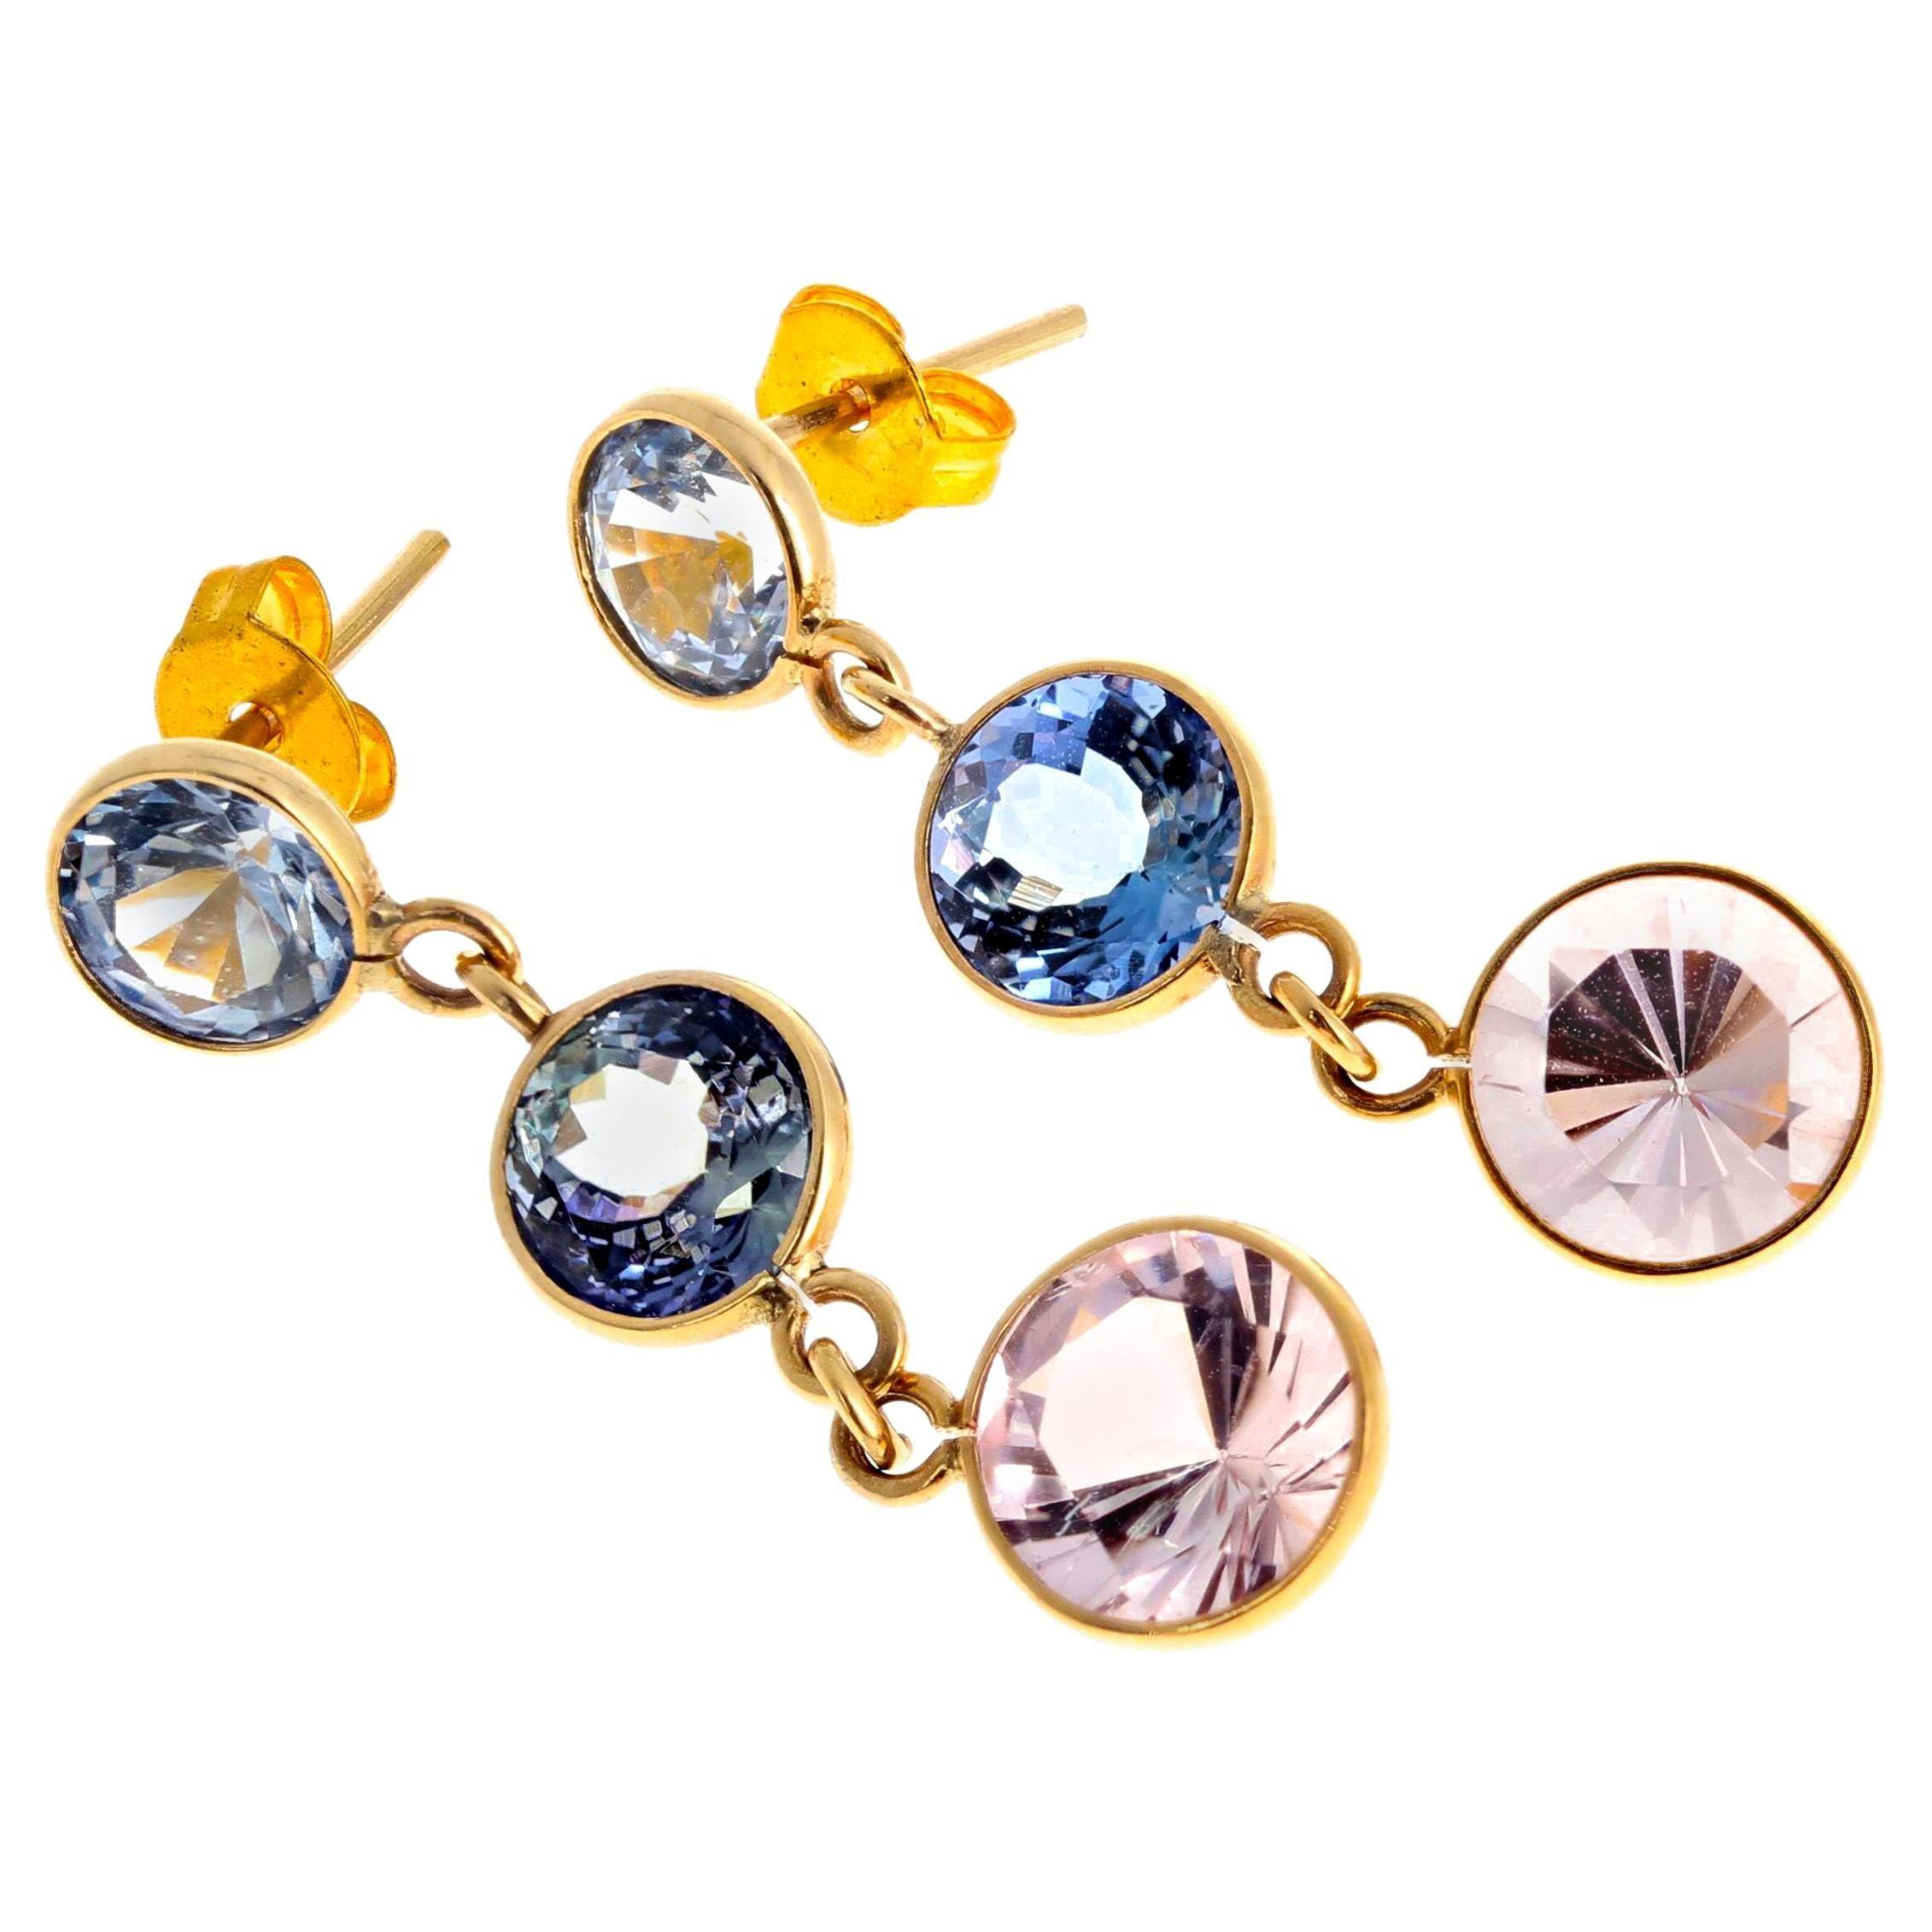 Gemjunky Glittering Swinging Sapphire & Morganite 18Kt Gold Stud Earrings